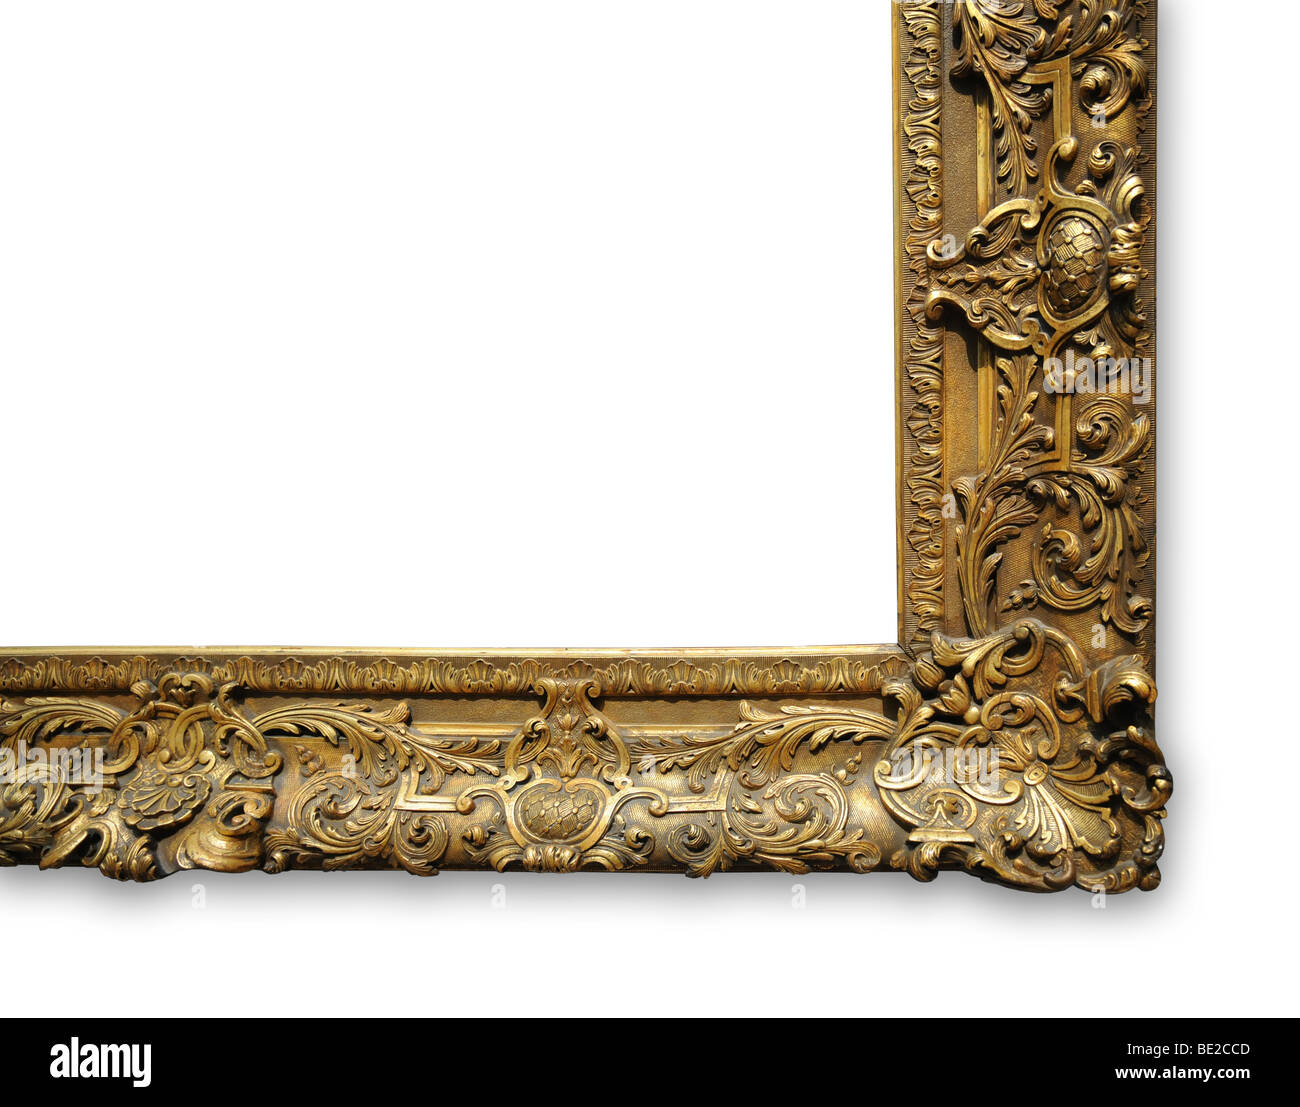 ornate gold frame border.  Ornate Corner Of Vintage Gold Frame With Space For Ad  Stock Image Inside Ornate Gold Frame Border E